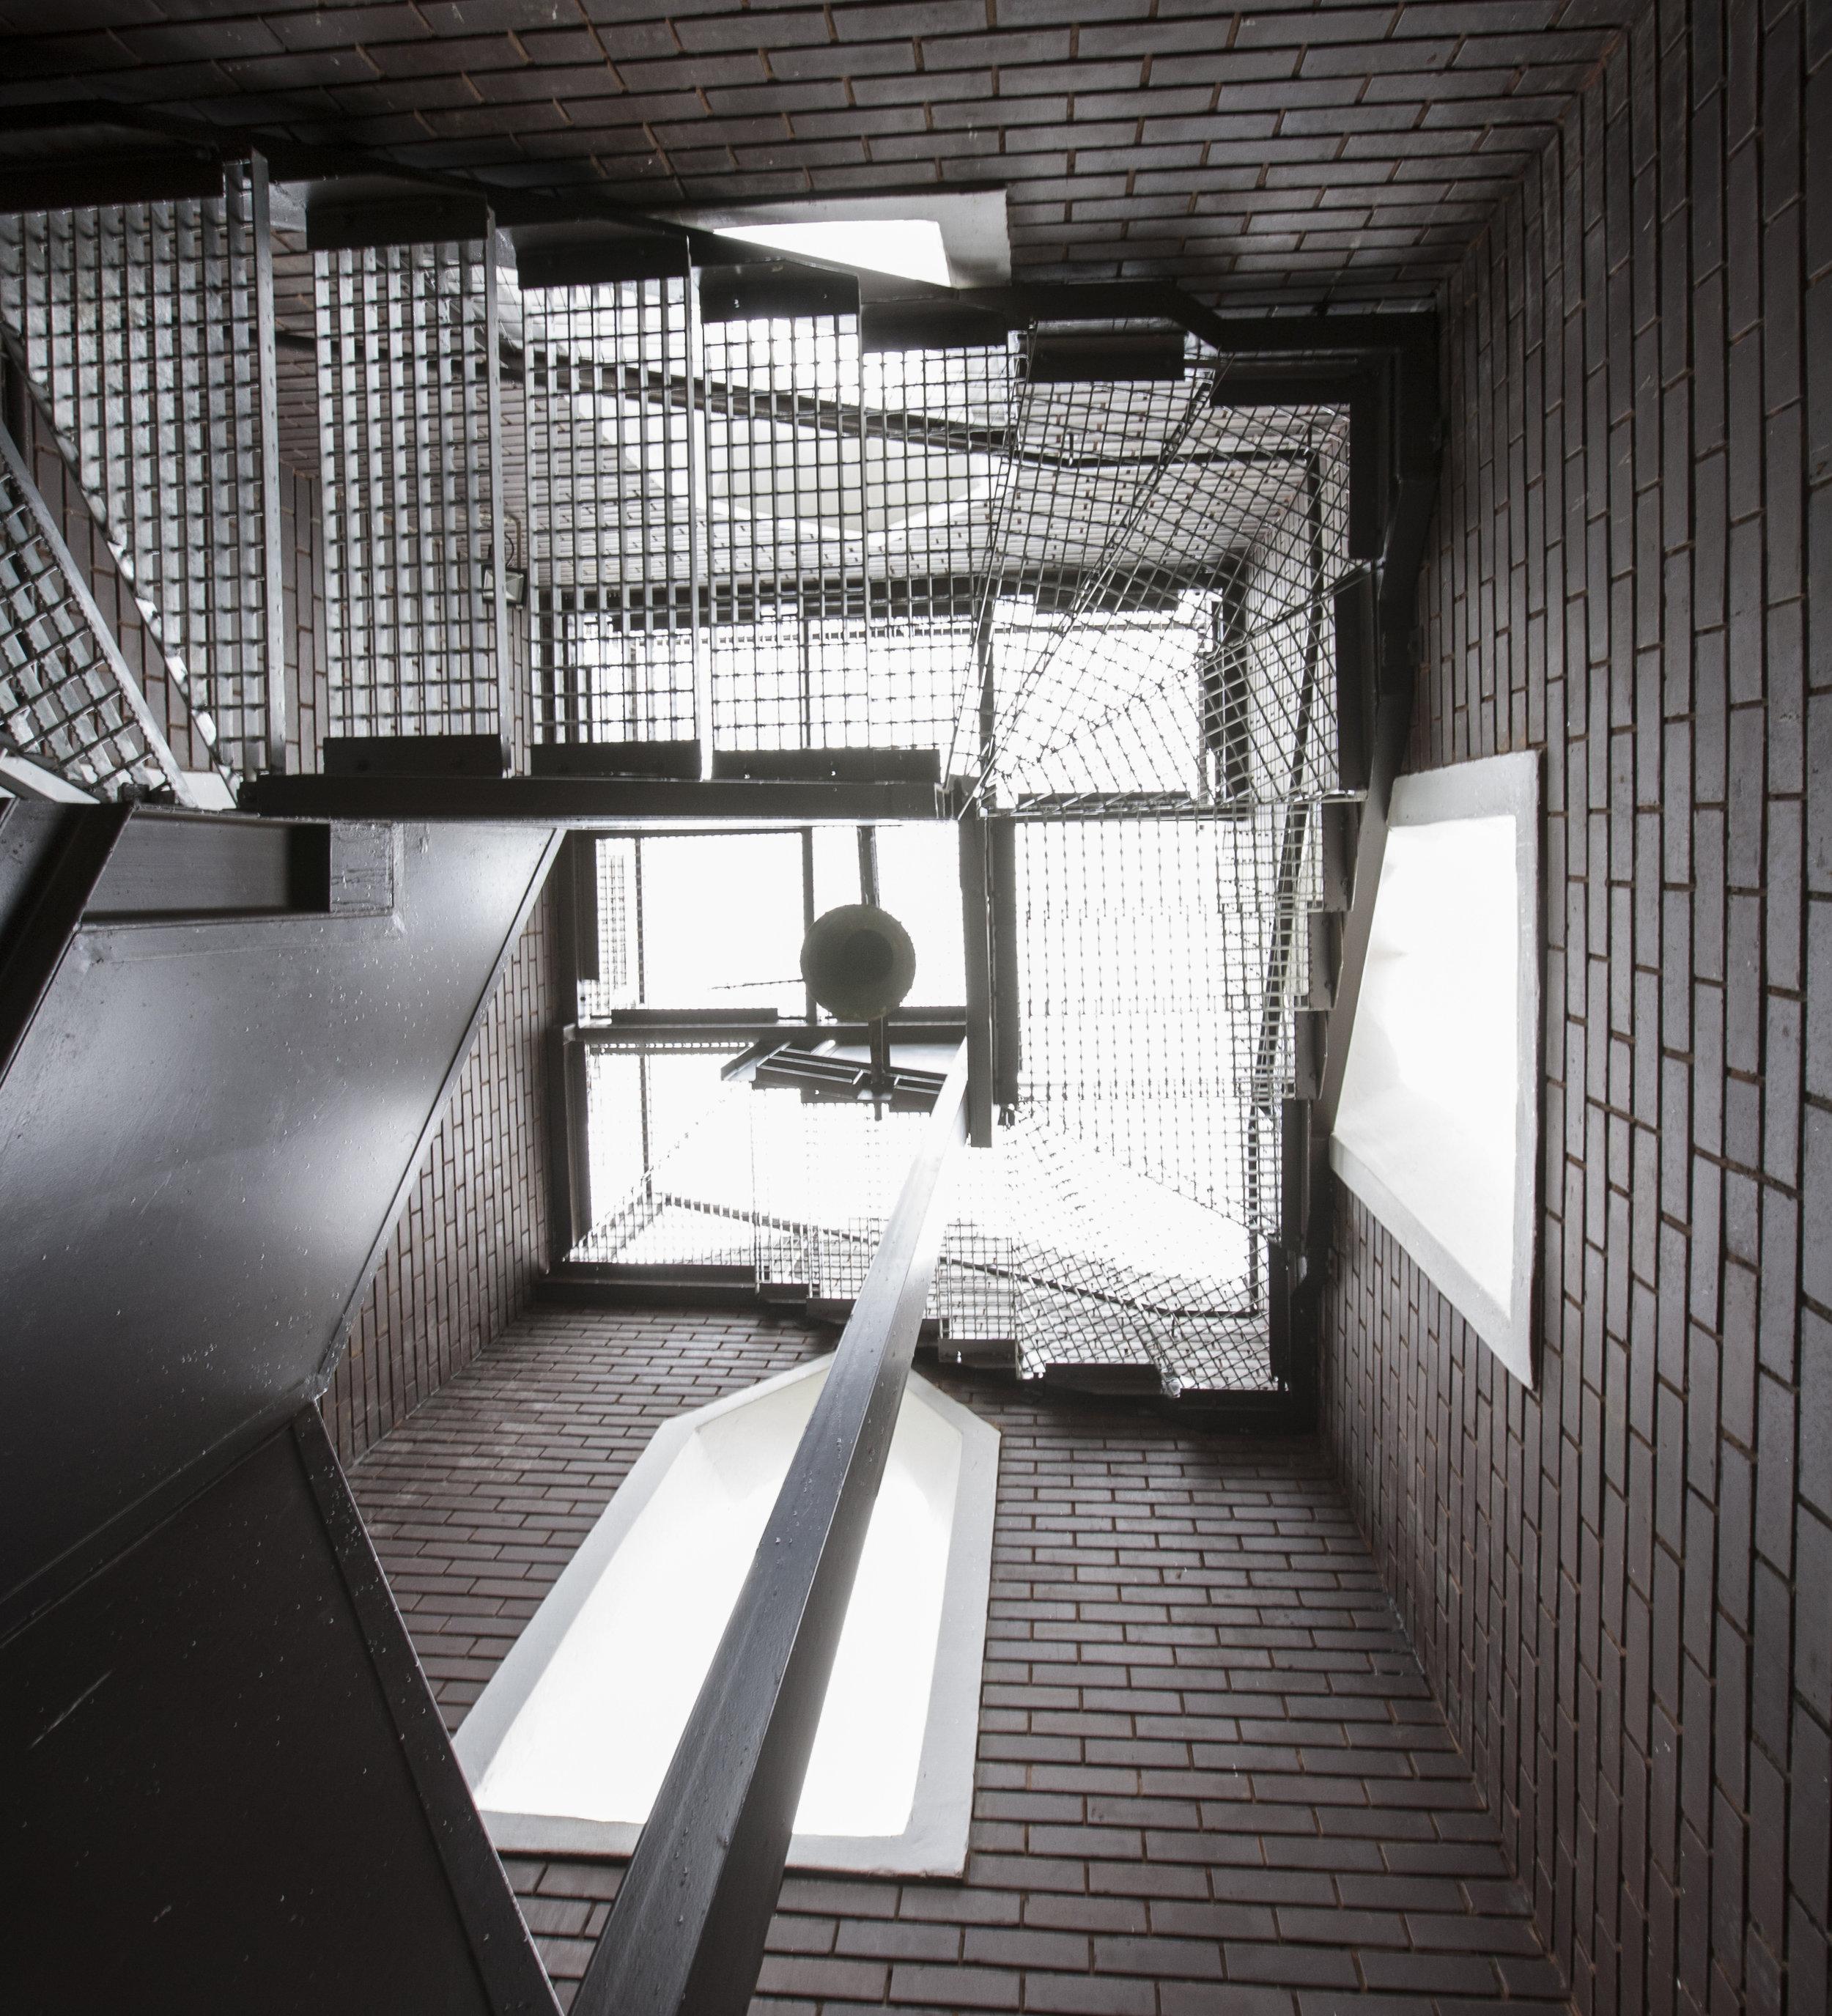 Moruleng Museum, Interior Of Bell Tower